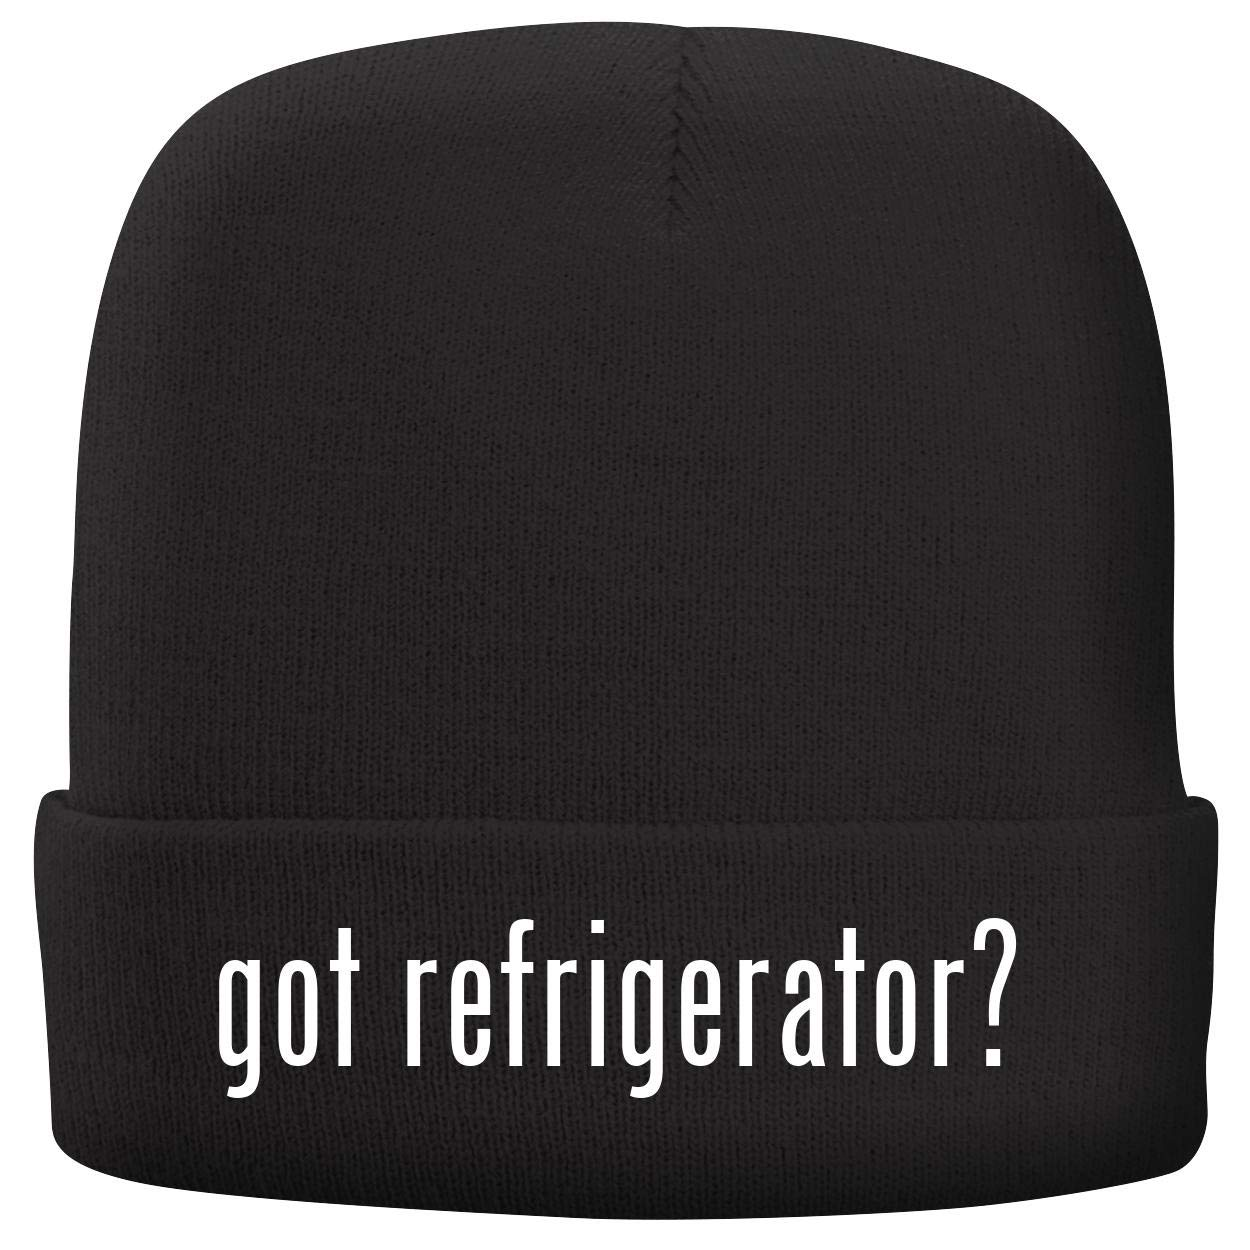 BH Cool Designs got Refrigerator? - Adult Comfortable Fleece Lined Beanie